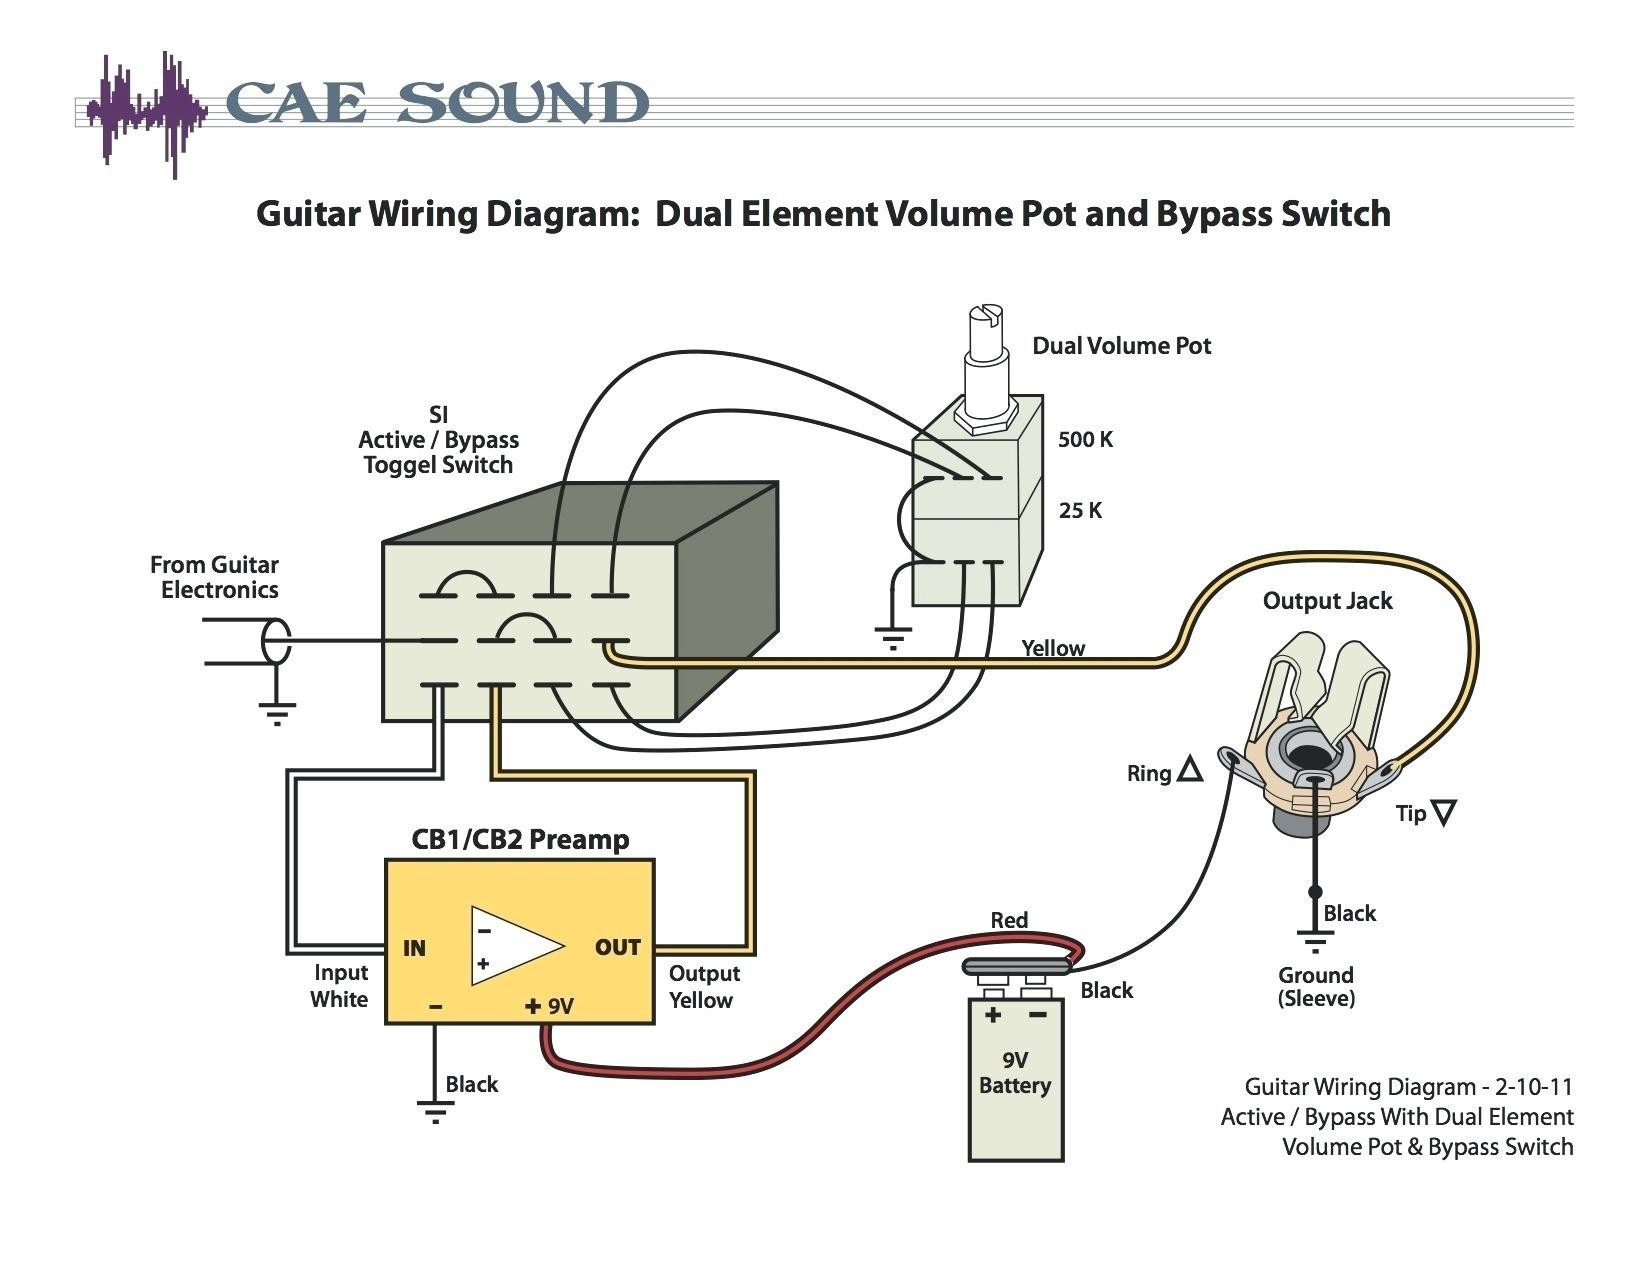 Active Guitar Wiring Diagram New Wiring Diagram for Jazz Bass Pickups New Fender Jazz Bass Wiring